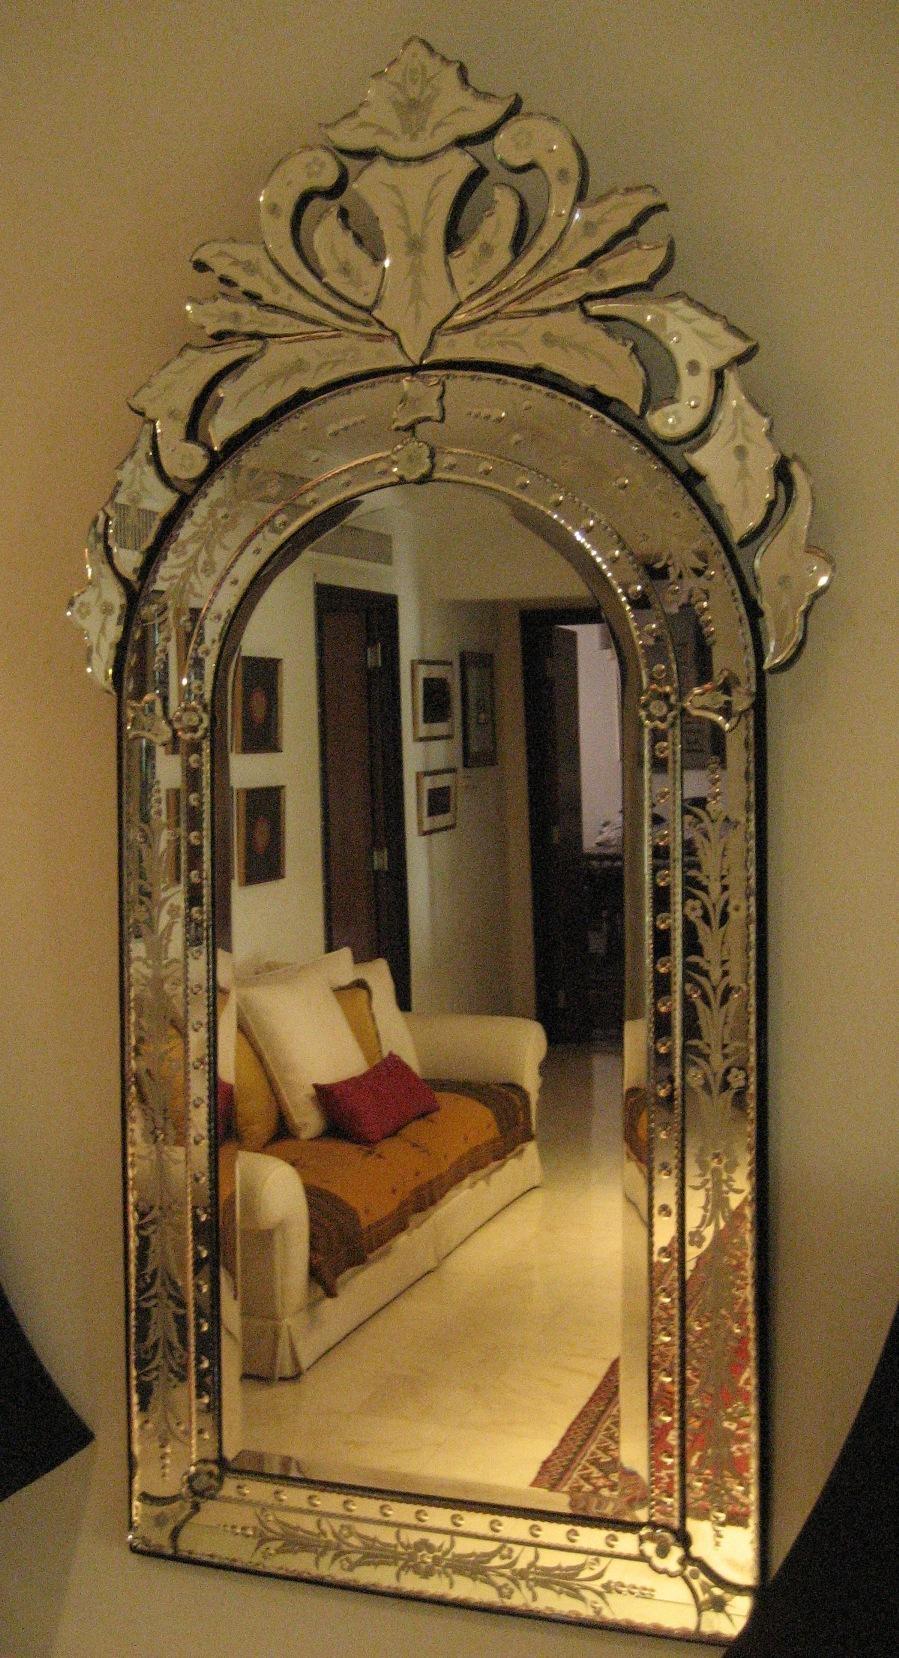 Venetian Mirrors | Home Decor & Furnishings Sale In Kuala Lumpur Within Large Venetian Mirrors (Image 18 of 20)